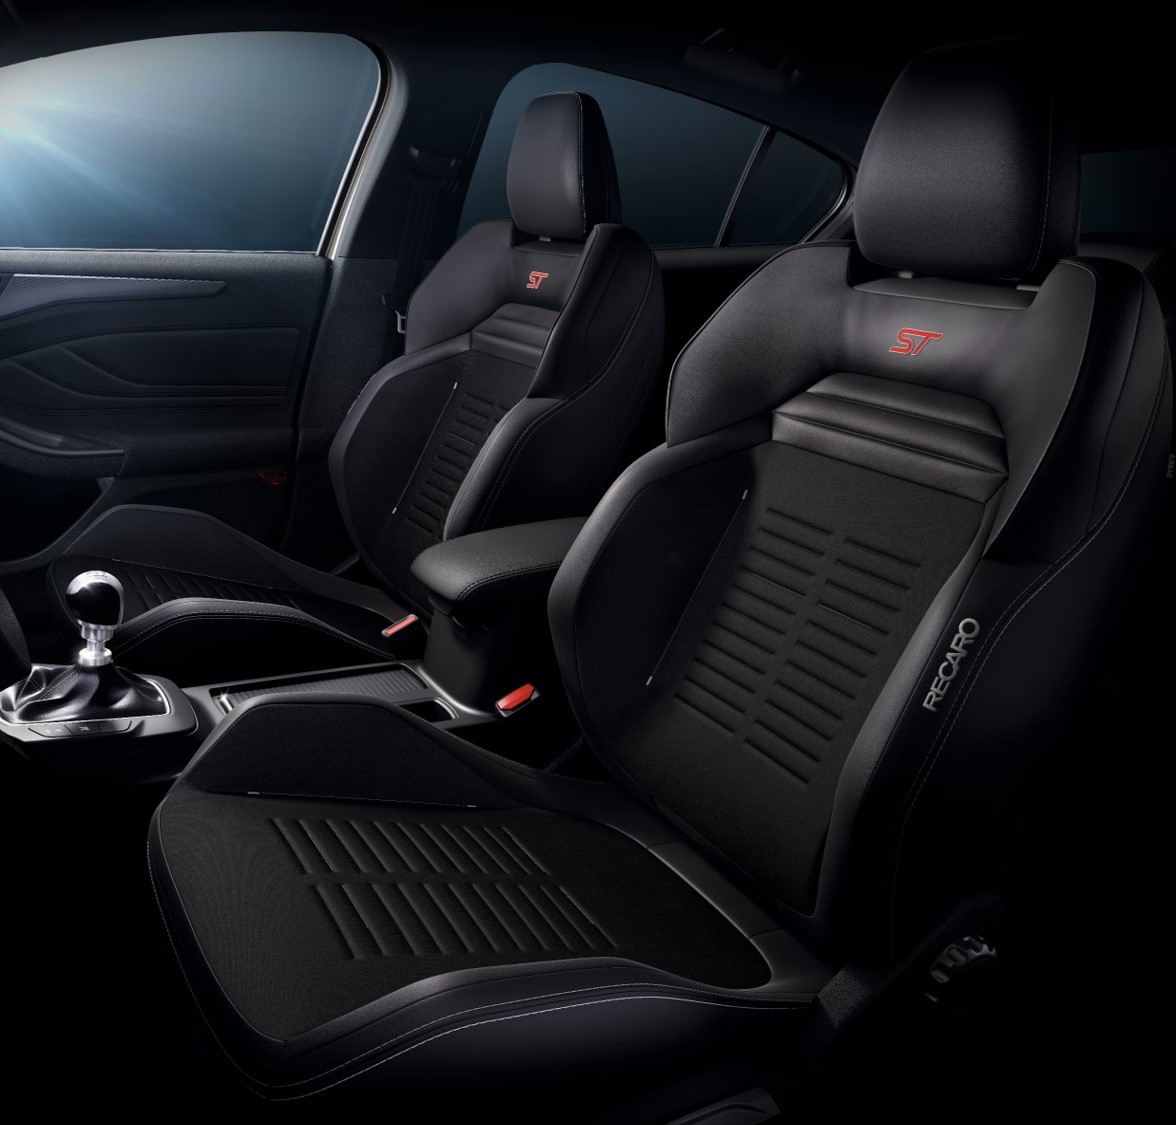 Ford Focus ST Wagon 標配 ST 專屬賽道級 RECARO 運動跑車座椅。